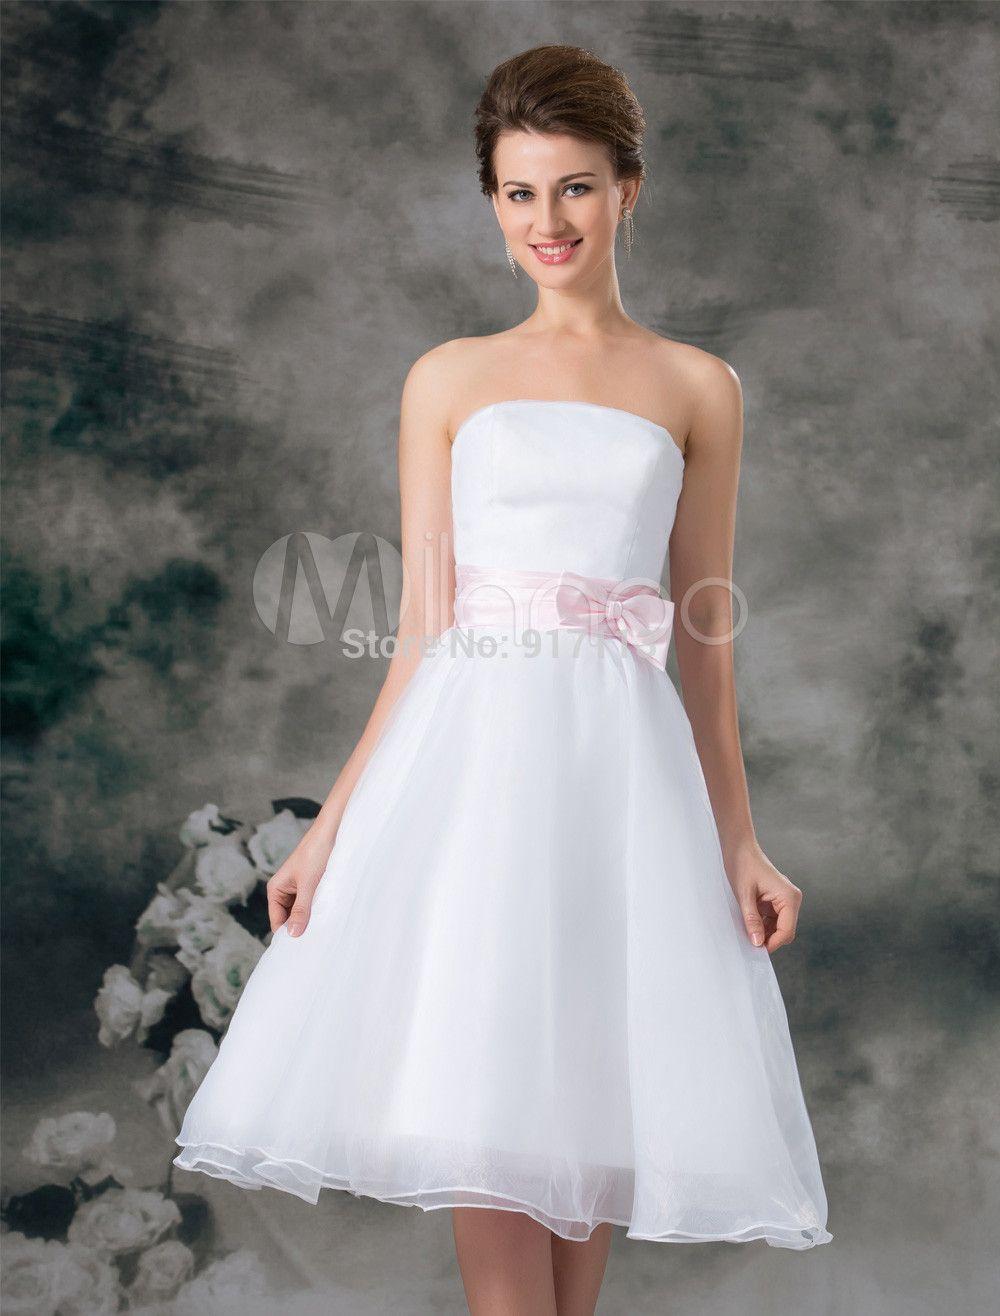 82 0us New White Ivory Romantic Short A Line Strapless Bow Organza Bridal Wedding Dress Custom Size 4 6 8 10 12 14 16 18 20 Custom Made Evening Dress Cust Knee Length Wedding [ 1316 x 1000 Pixel ]